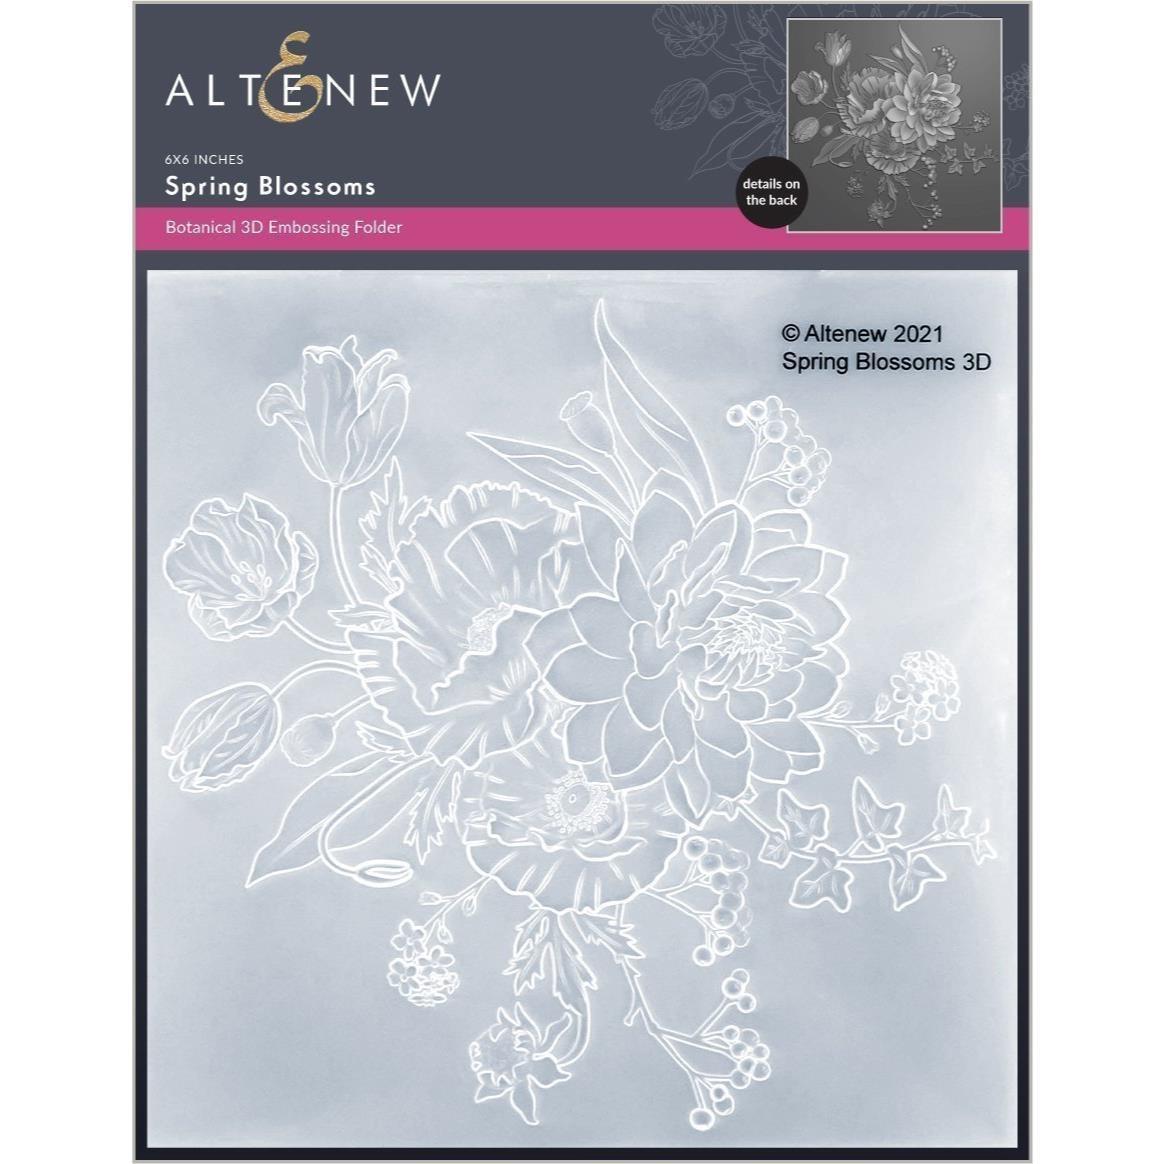 Spring Blossoms 3D, Altenew Embossing Folders -